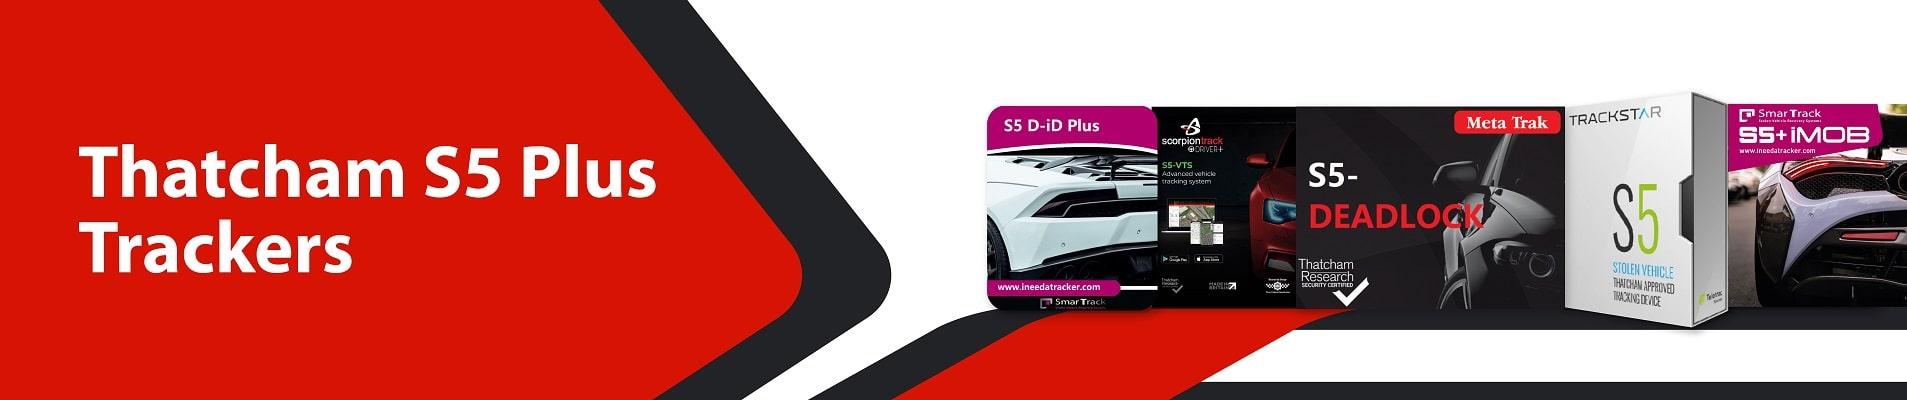 Thatcham S5 Plus Trackers